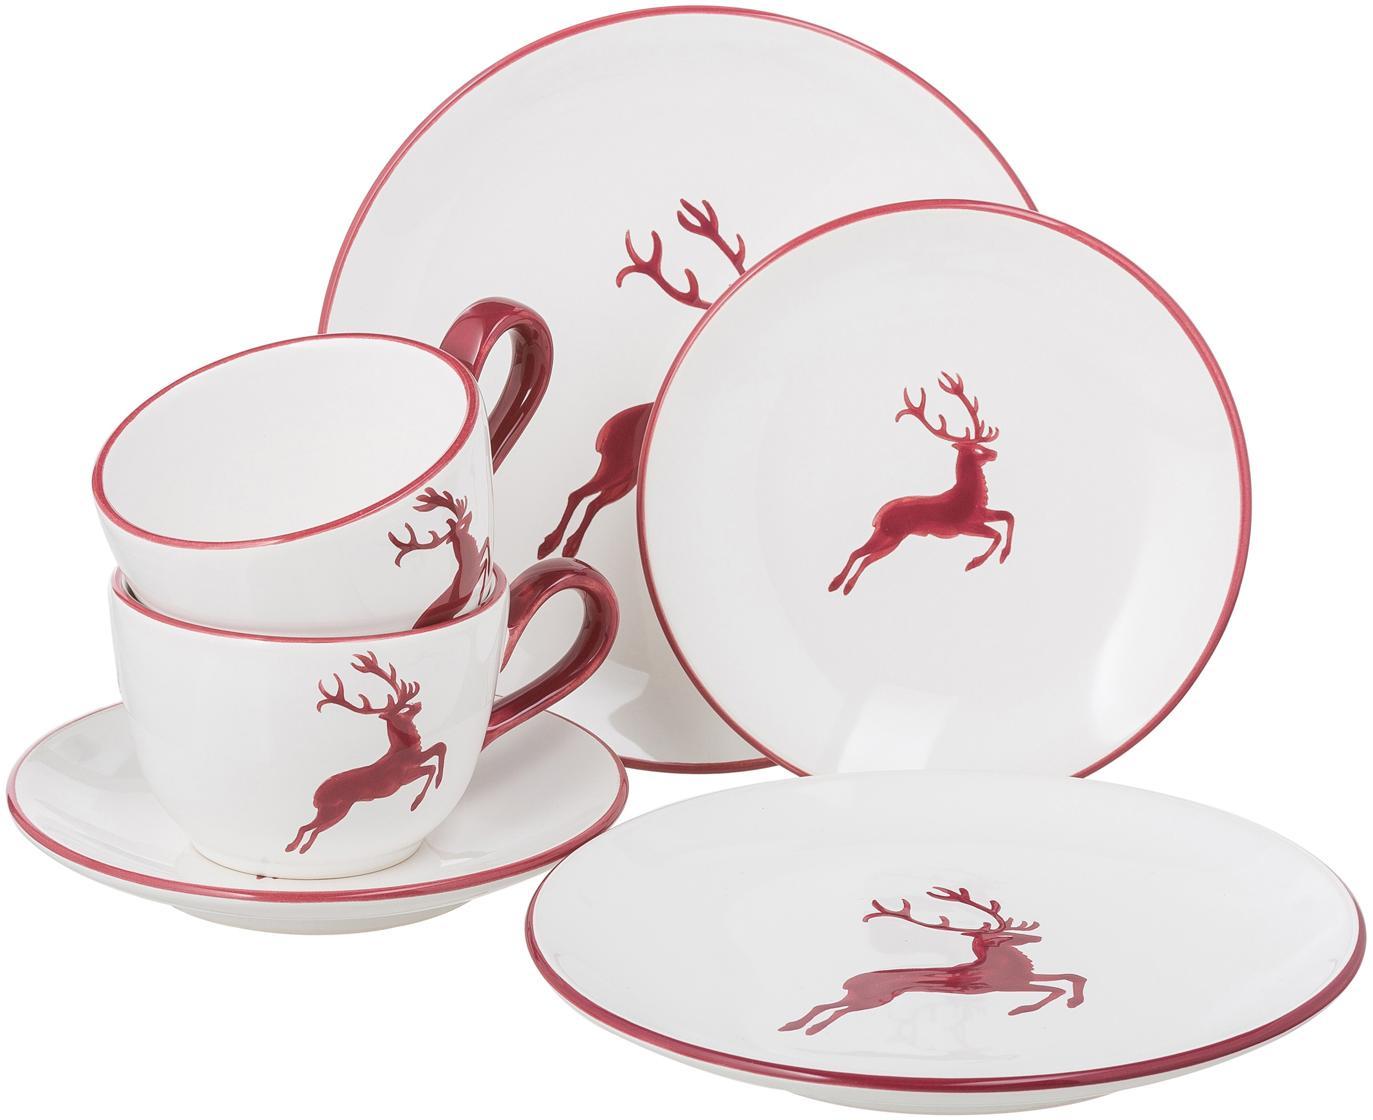 Set de café artesanal Classic Roter Hirsch, 2comensales (6pzas.), Cerámica, Blanco, rojo burdeos, Set de diferentes tamaños